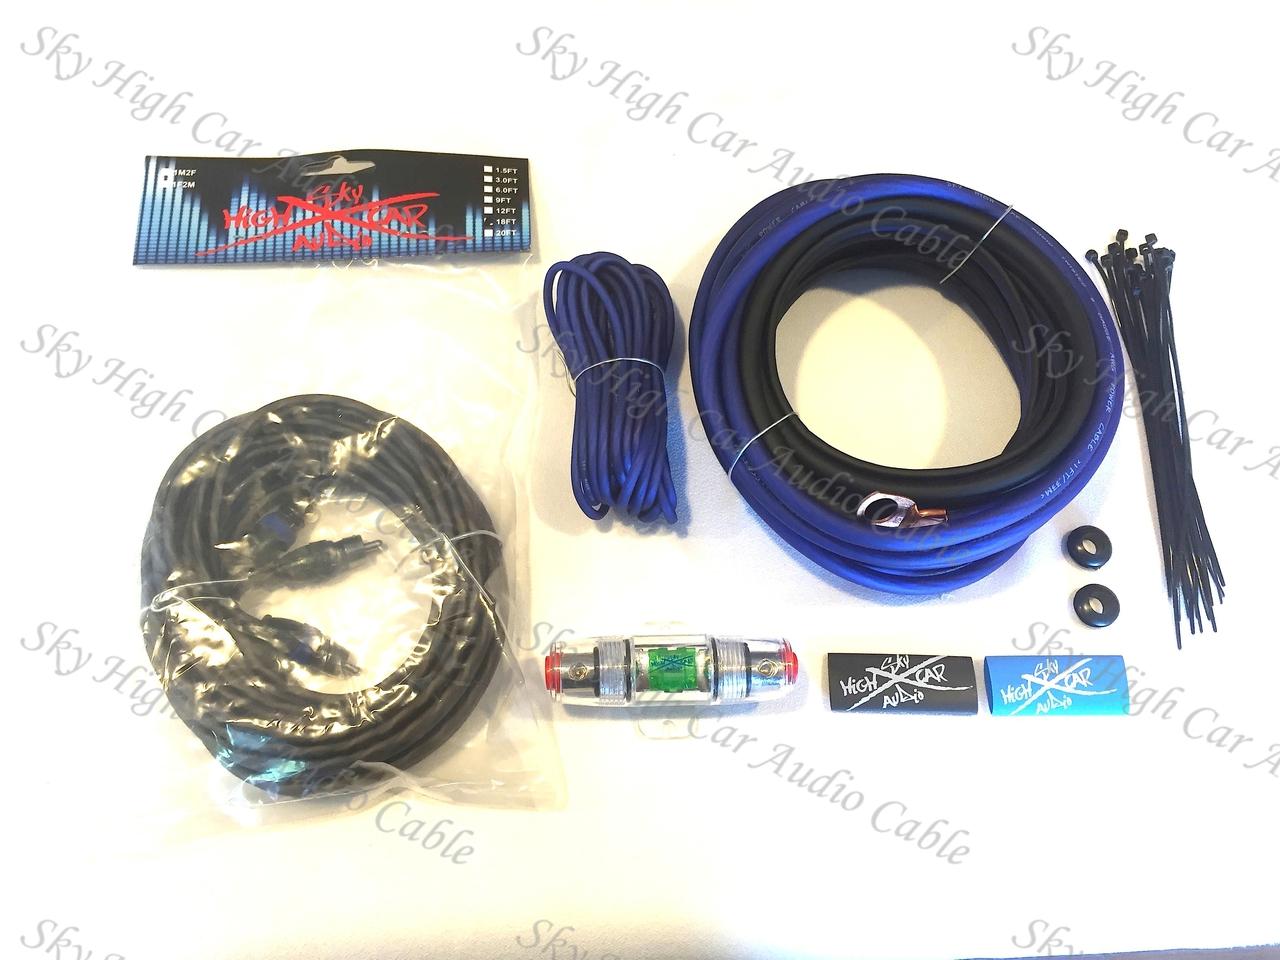 Sky High Car Audio 8 CCA Amp Kit